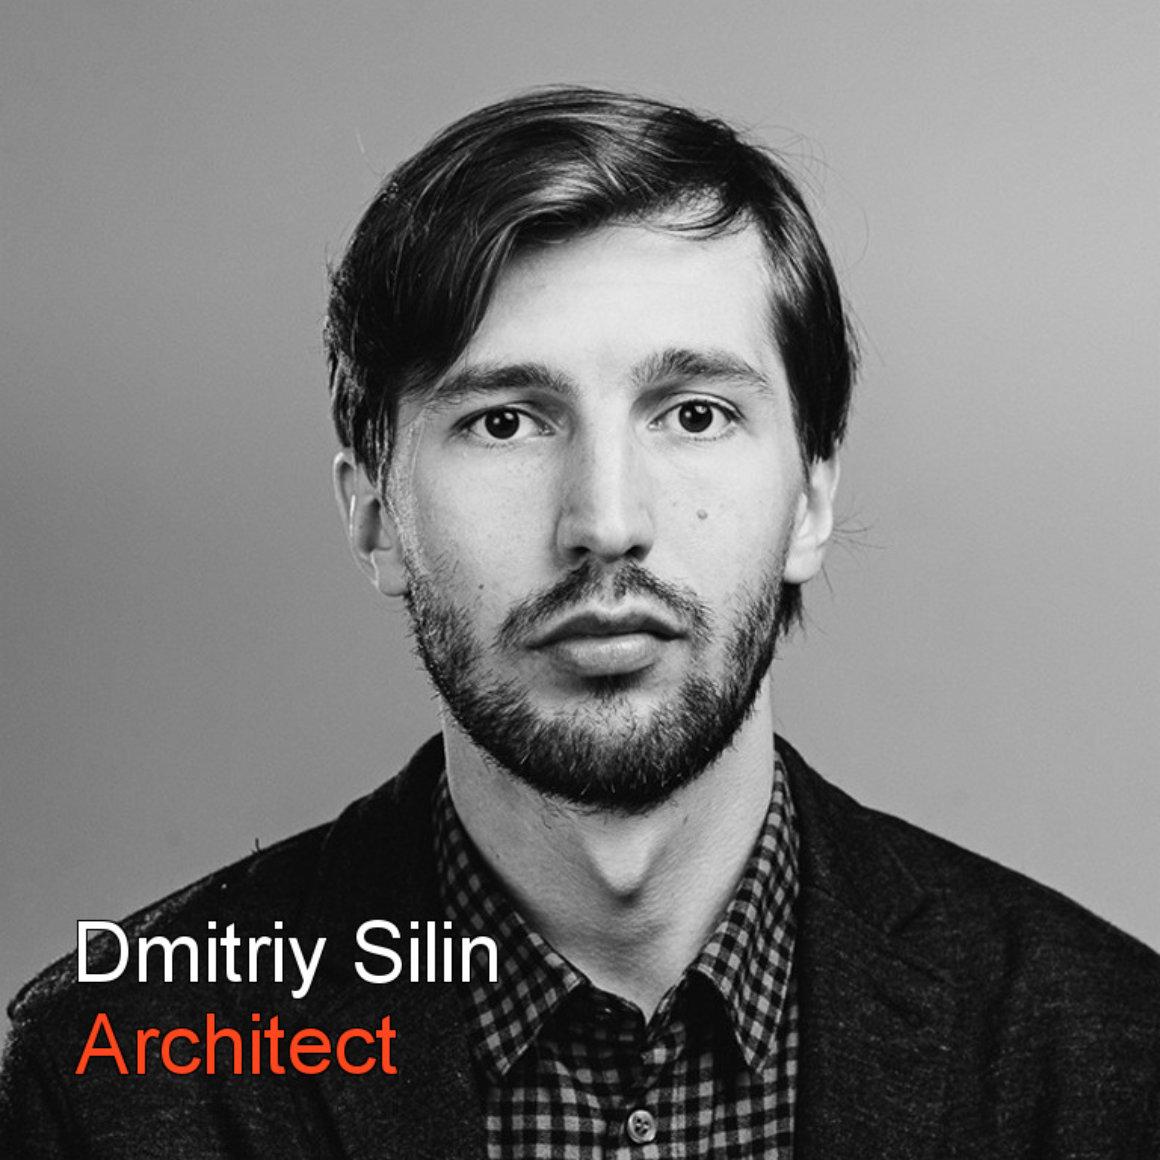 Dmitri Silin Architect BW